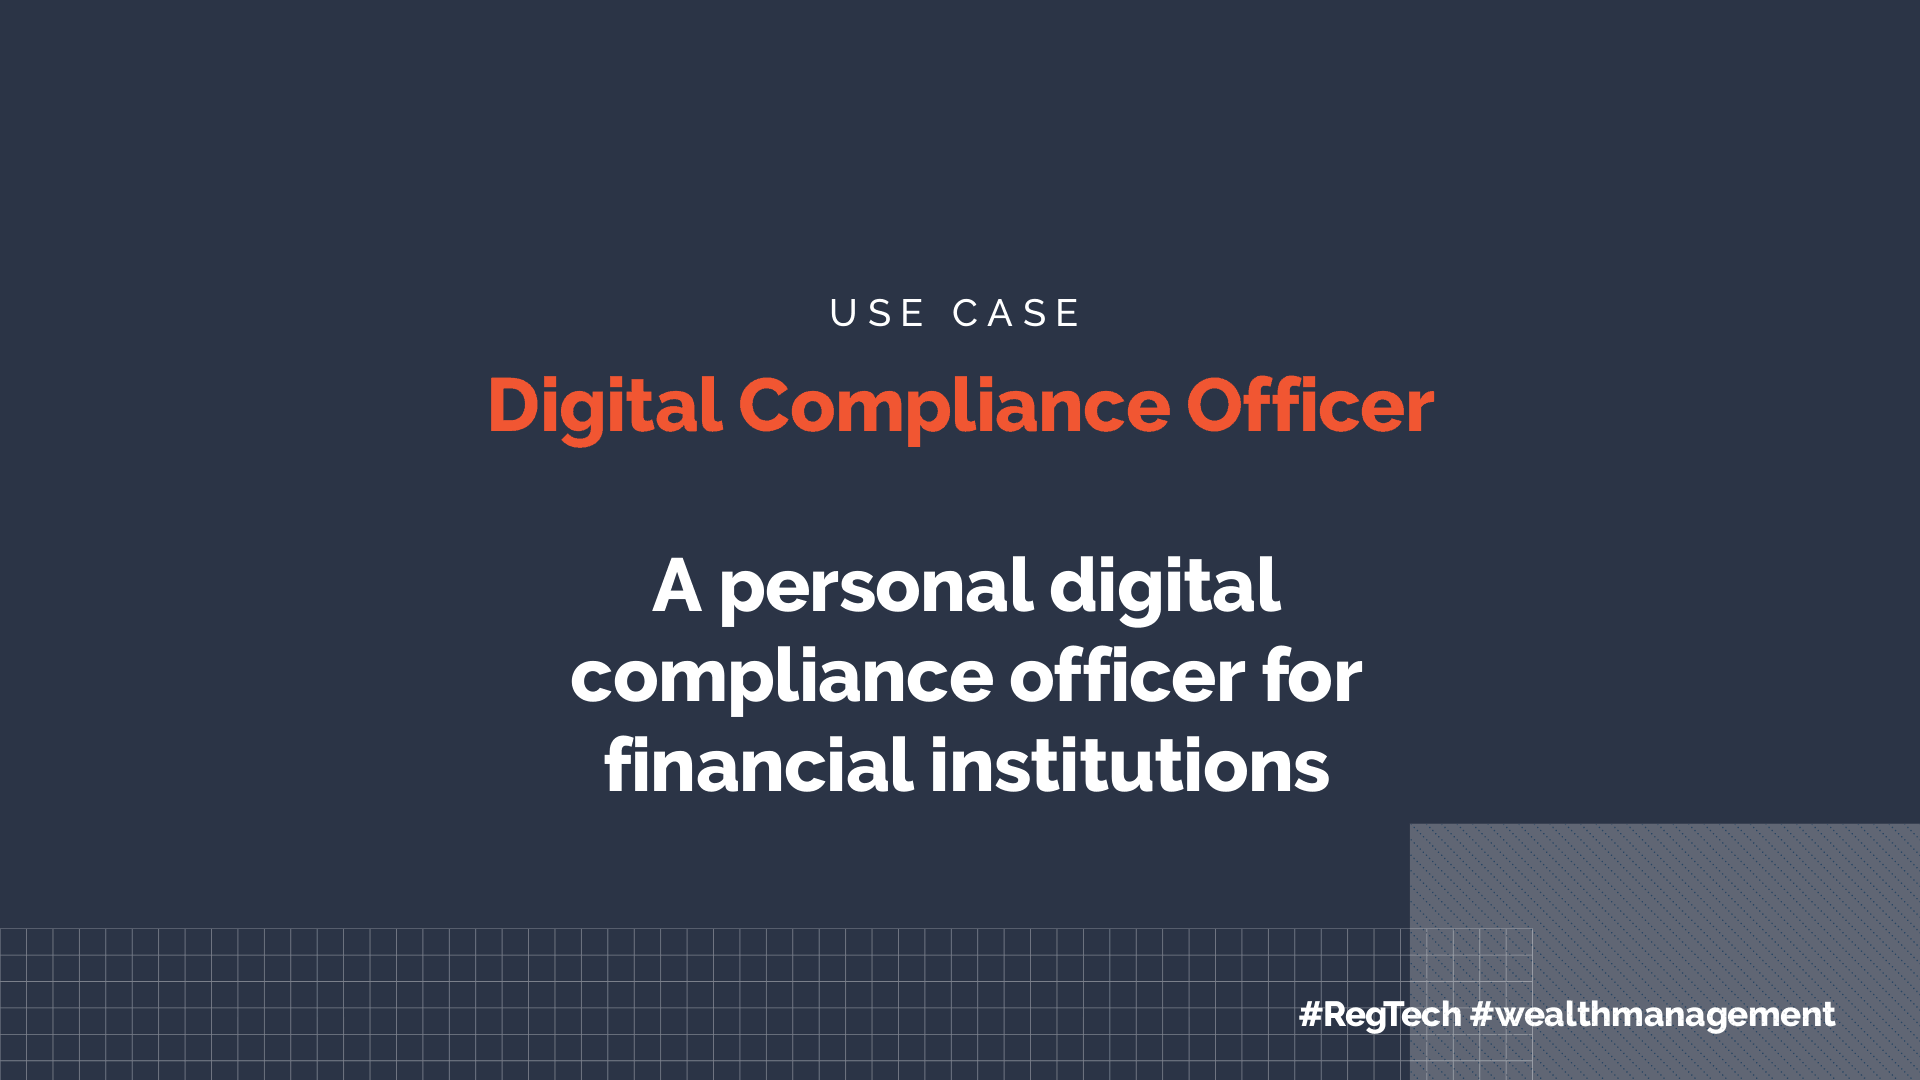 Digital Compliance Officer